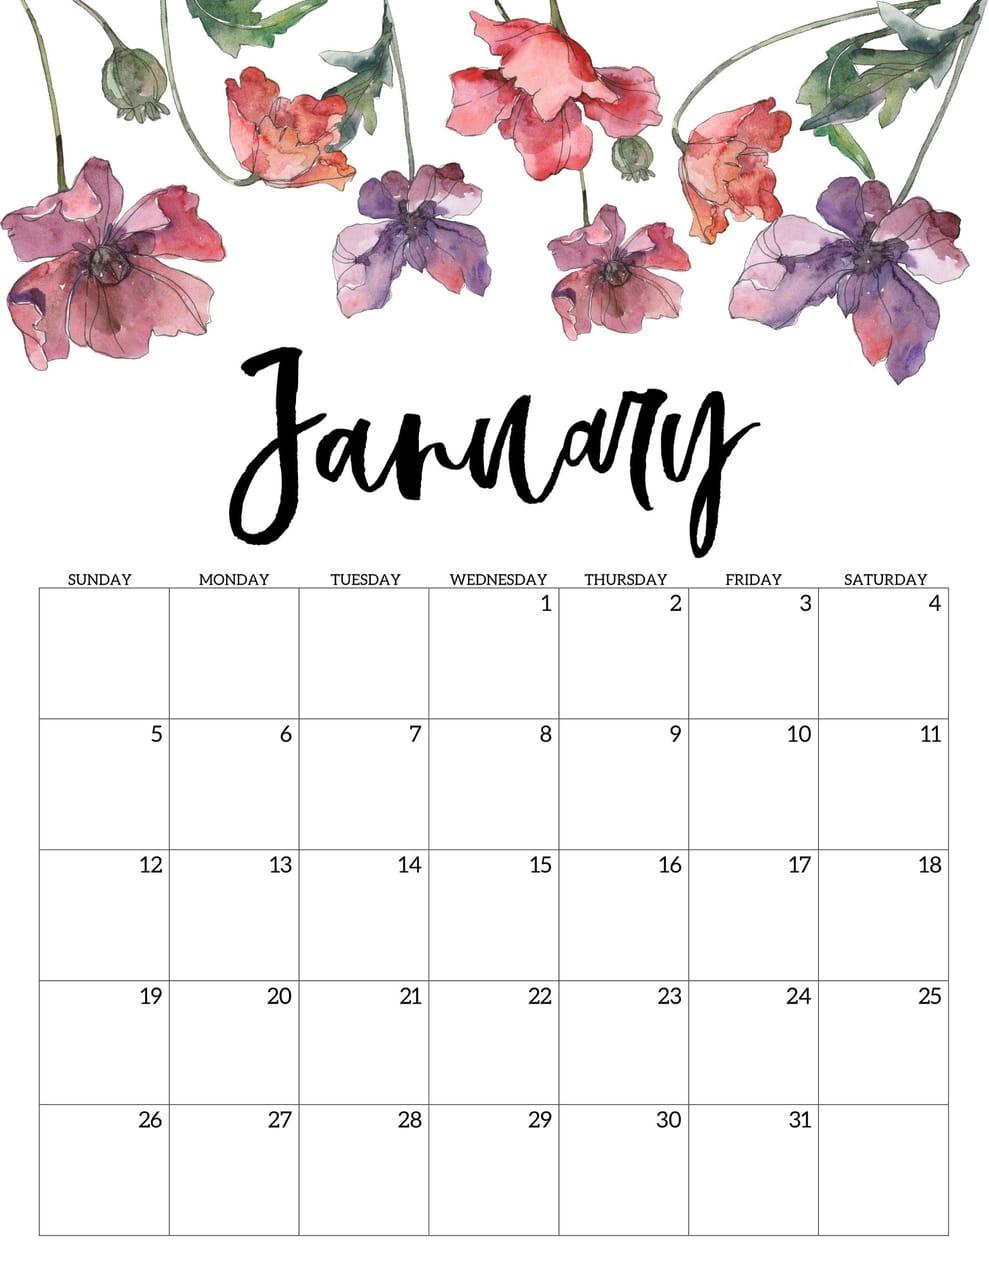 Cute January 2020 Calendar Wallpaper on We Heart It 989x1280